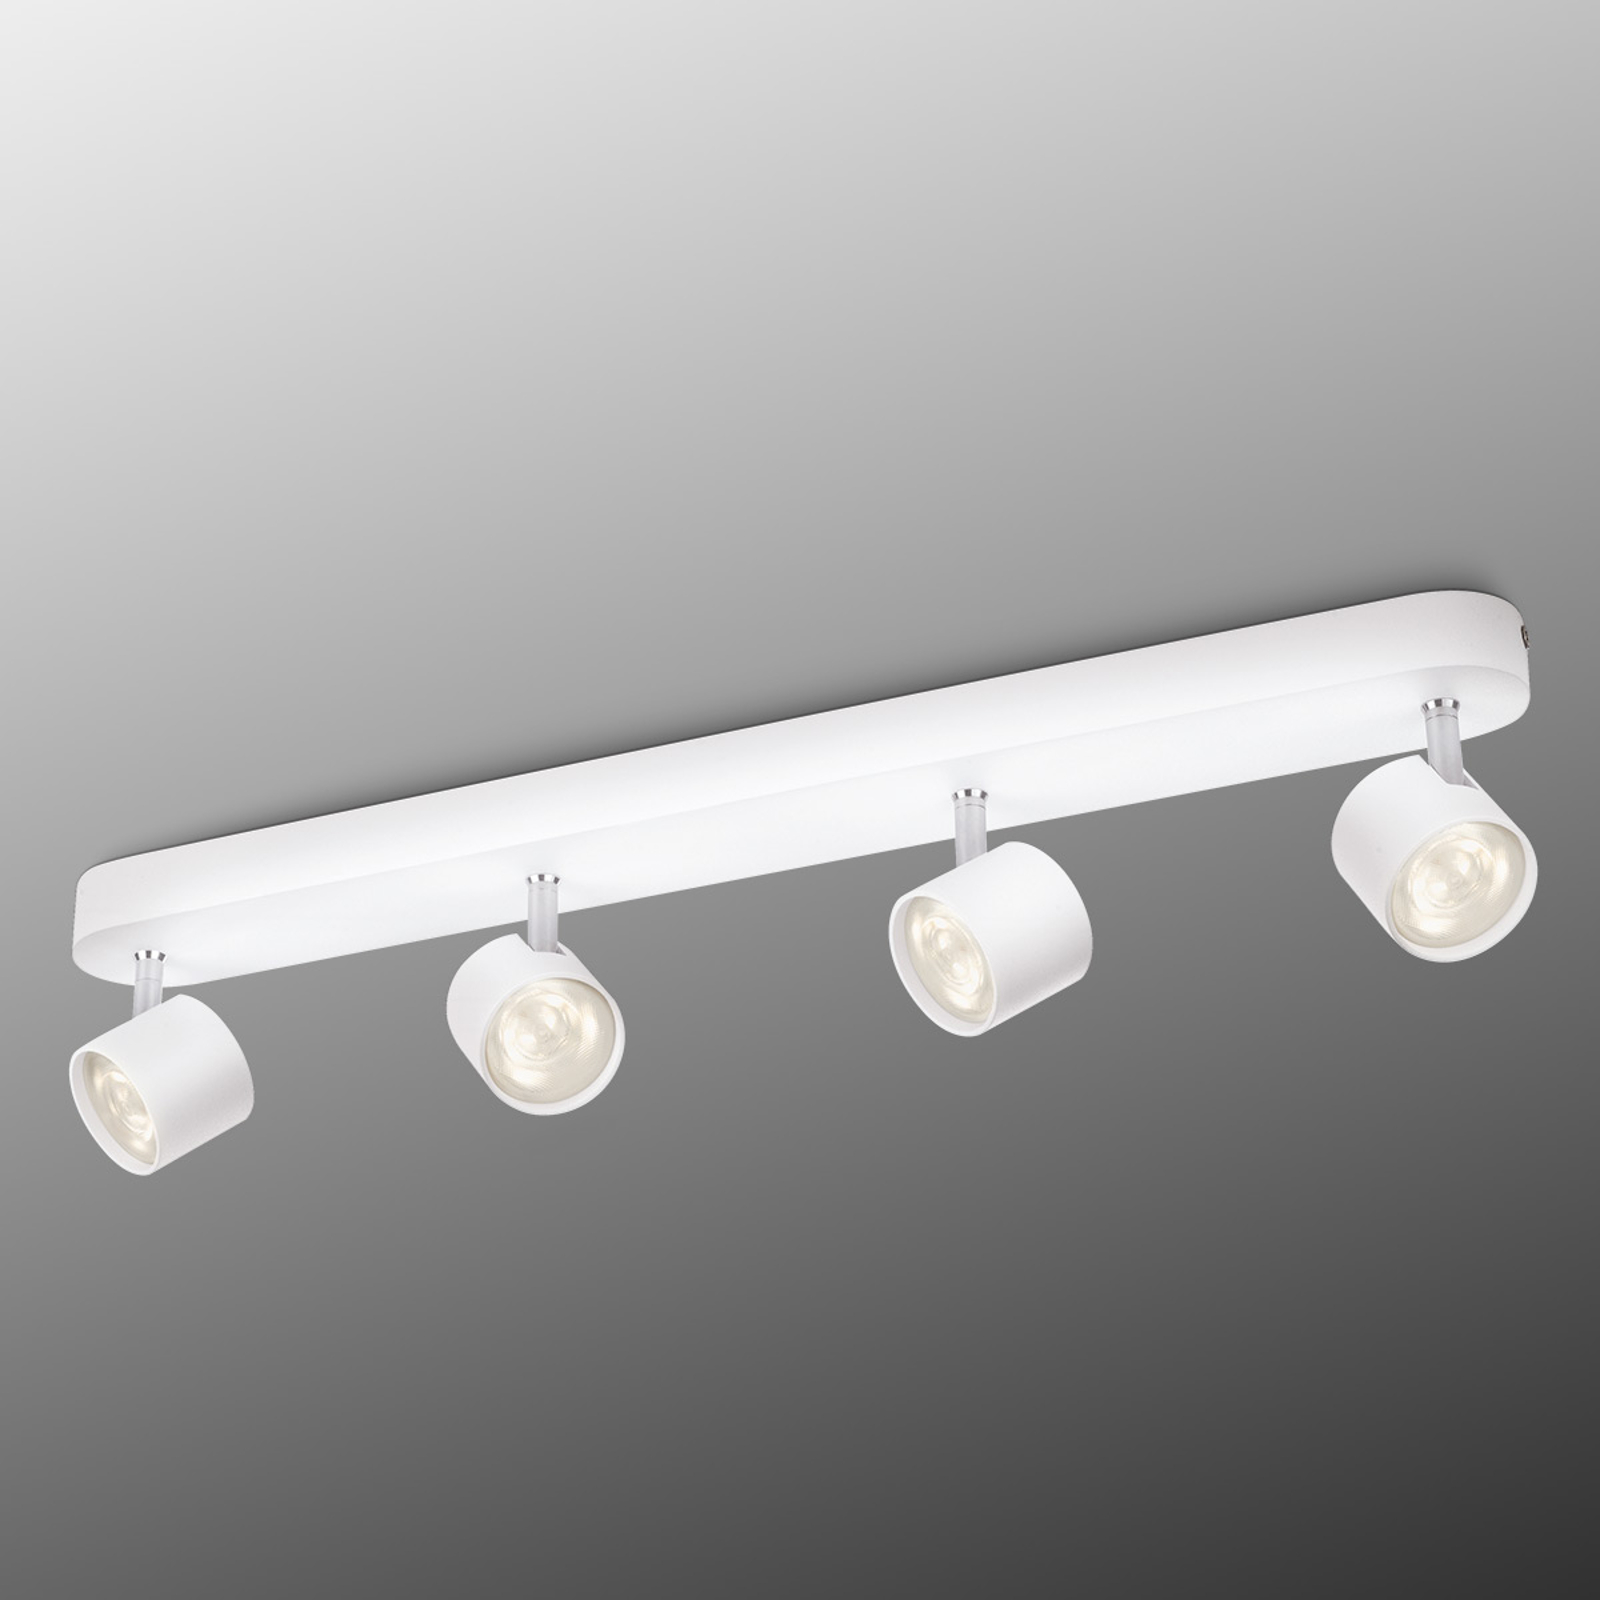 LED loftlampe Star, m. 4 lyskilder